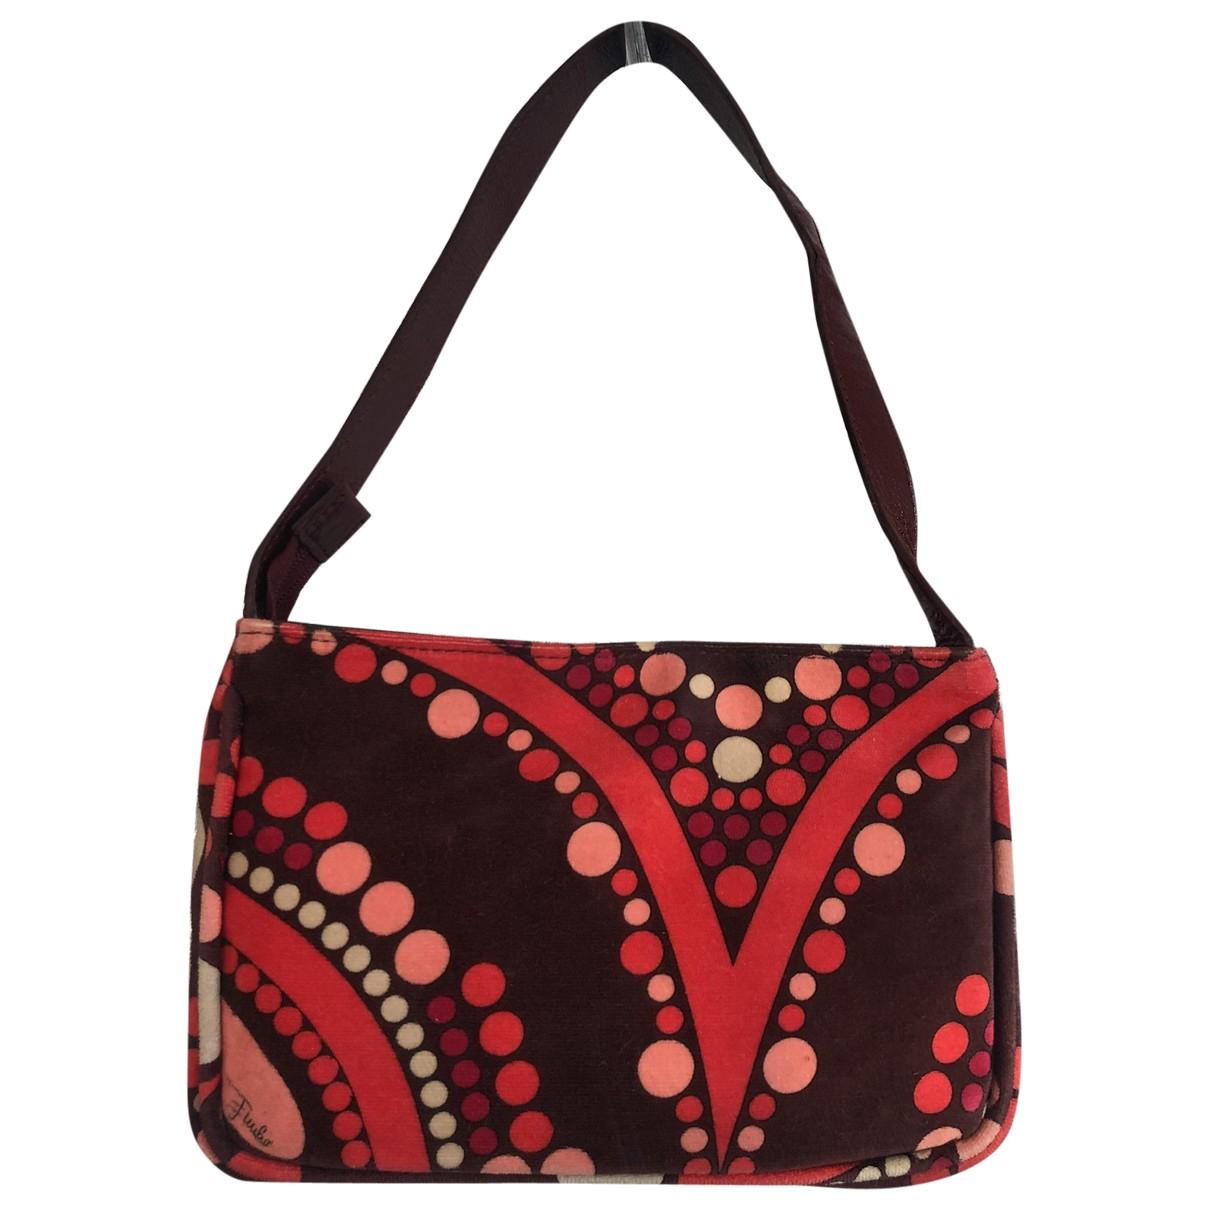 Emilio Pucci \N Multicolour Velvet Clutch bag for Women \N